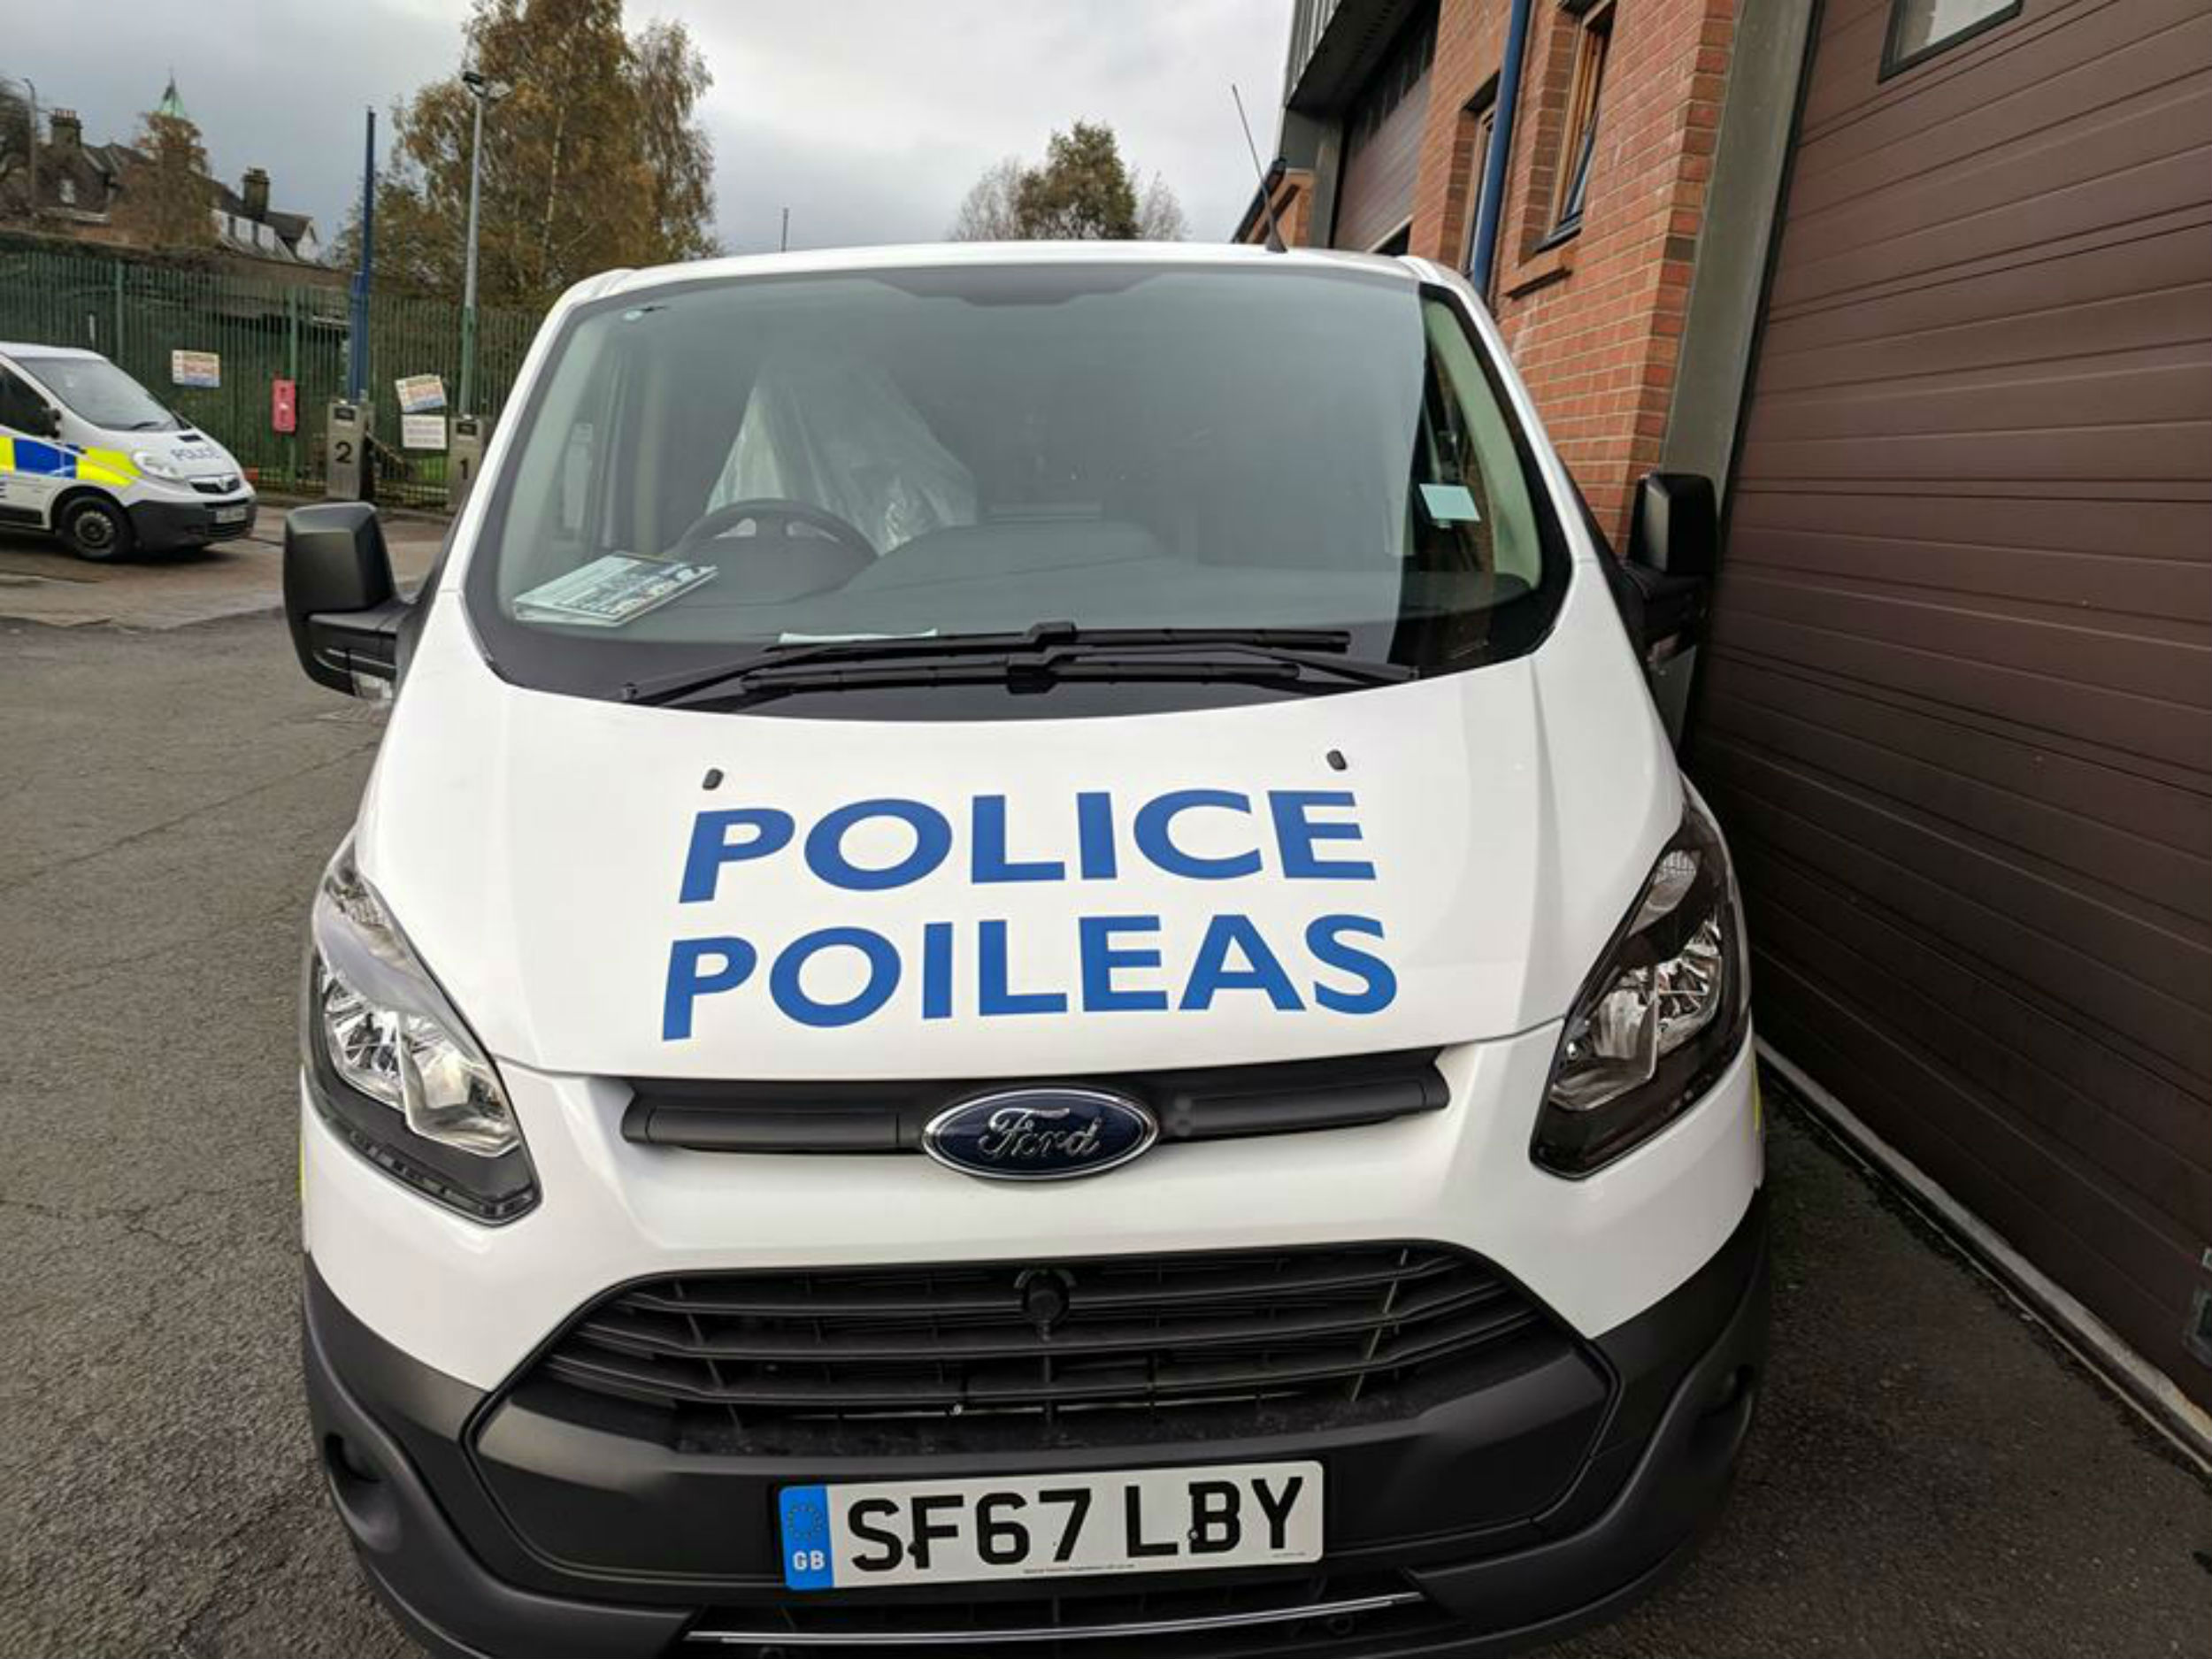 Gaelic police vans slammed after is unveil